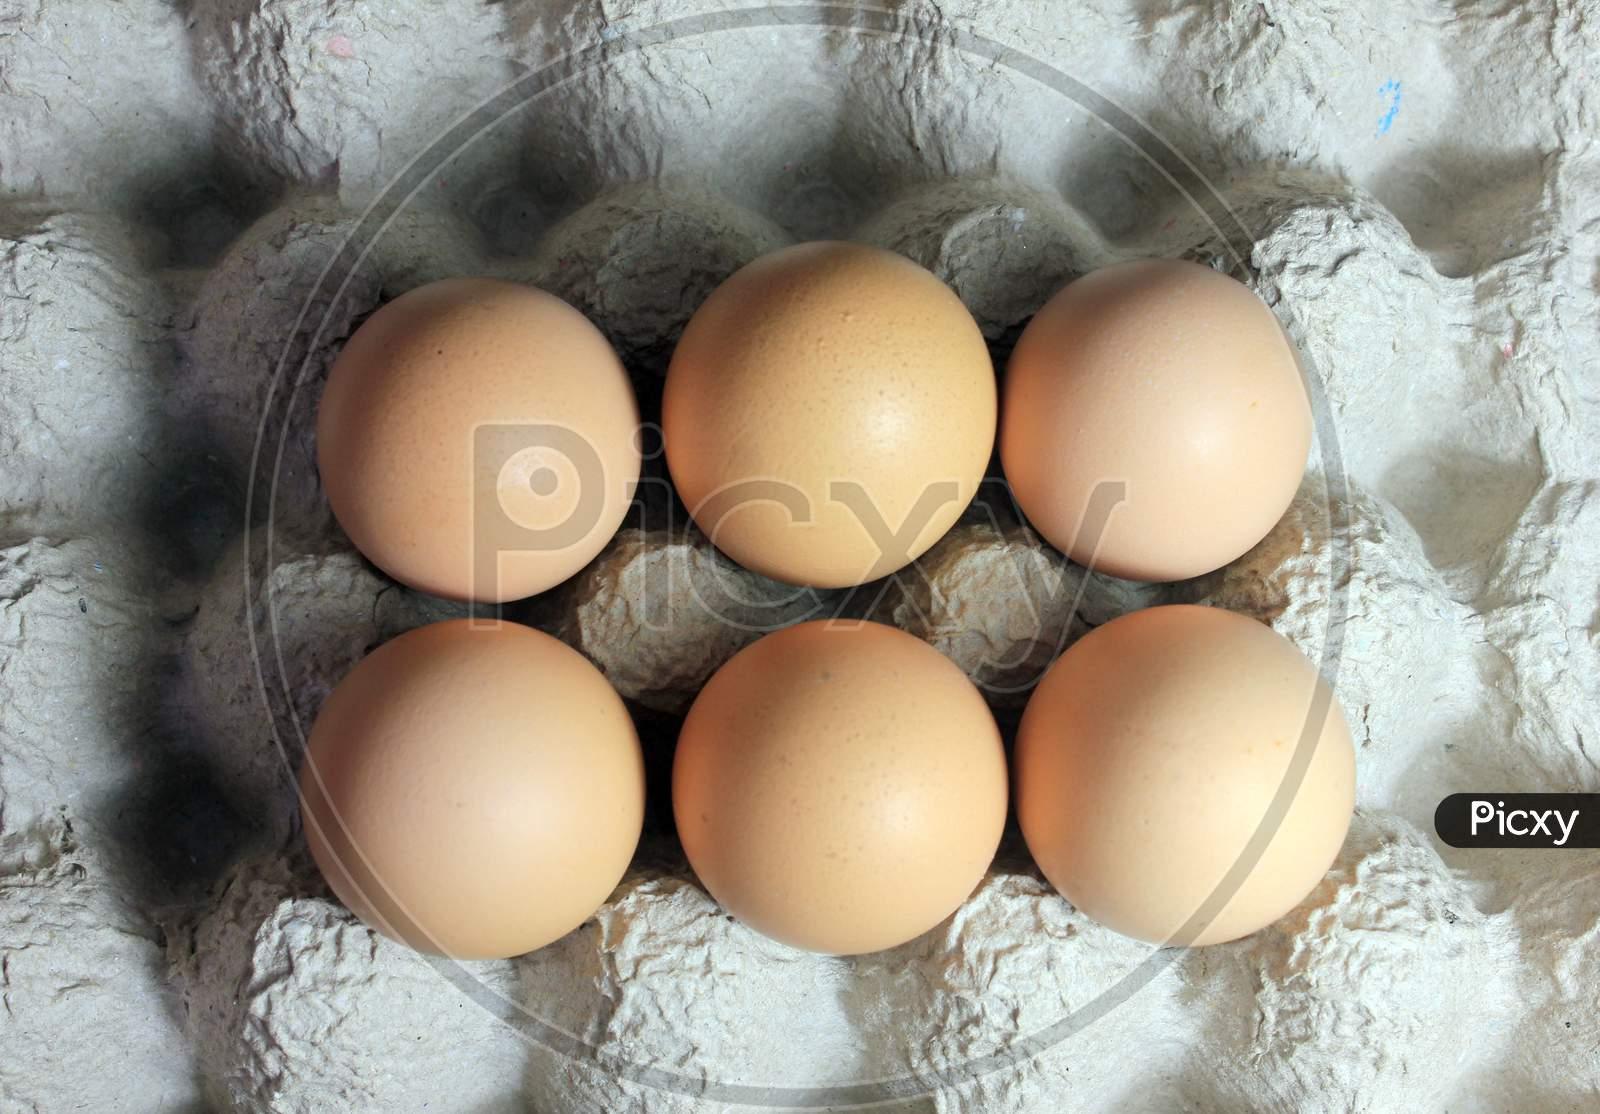 Brown Eggs On The Carton Stock Photo